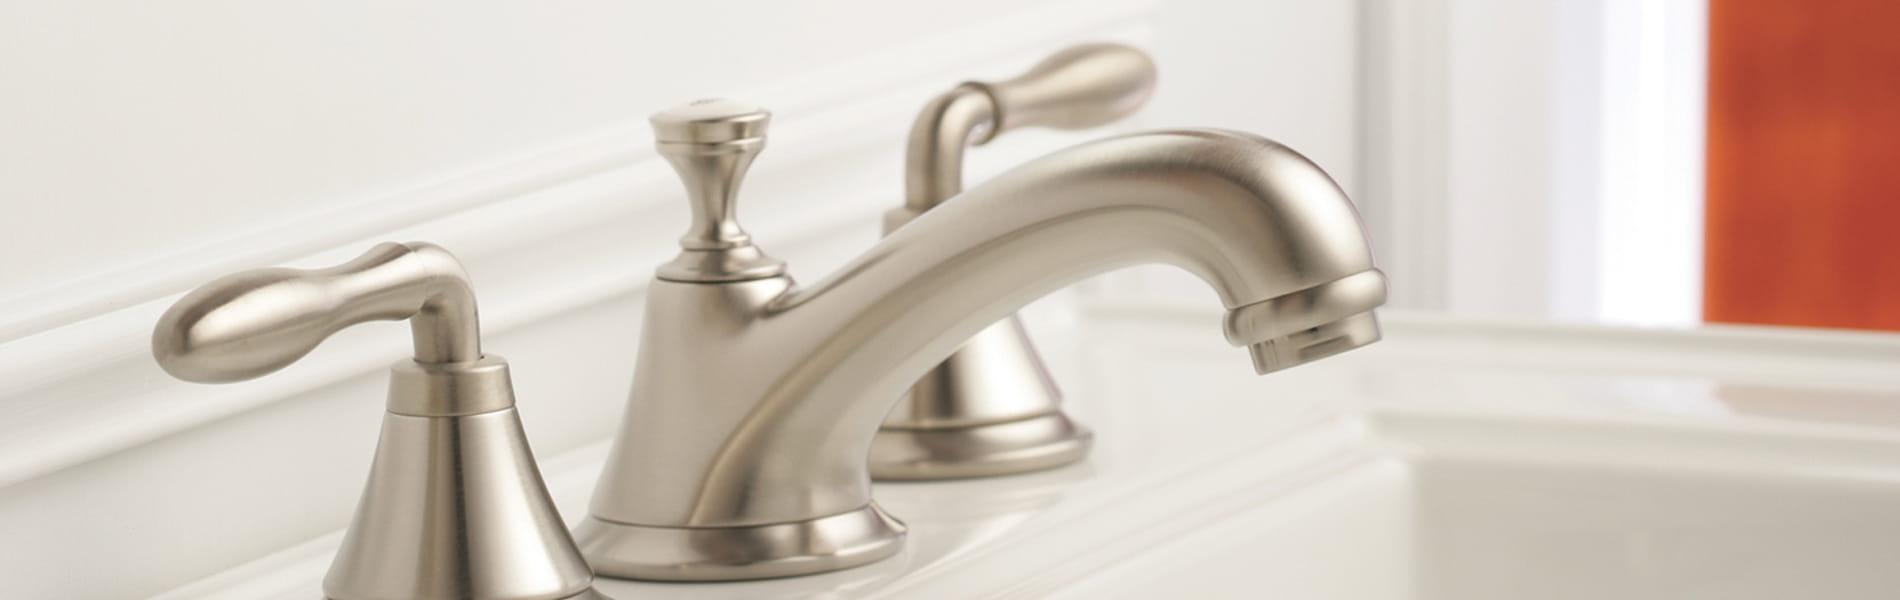 Seabury Bathroom Faucet